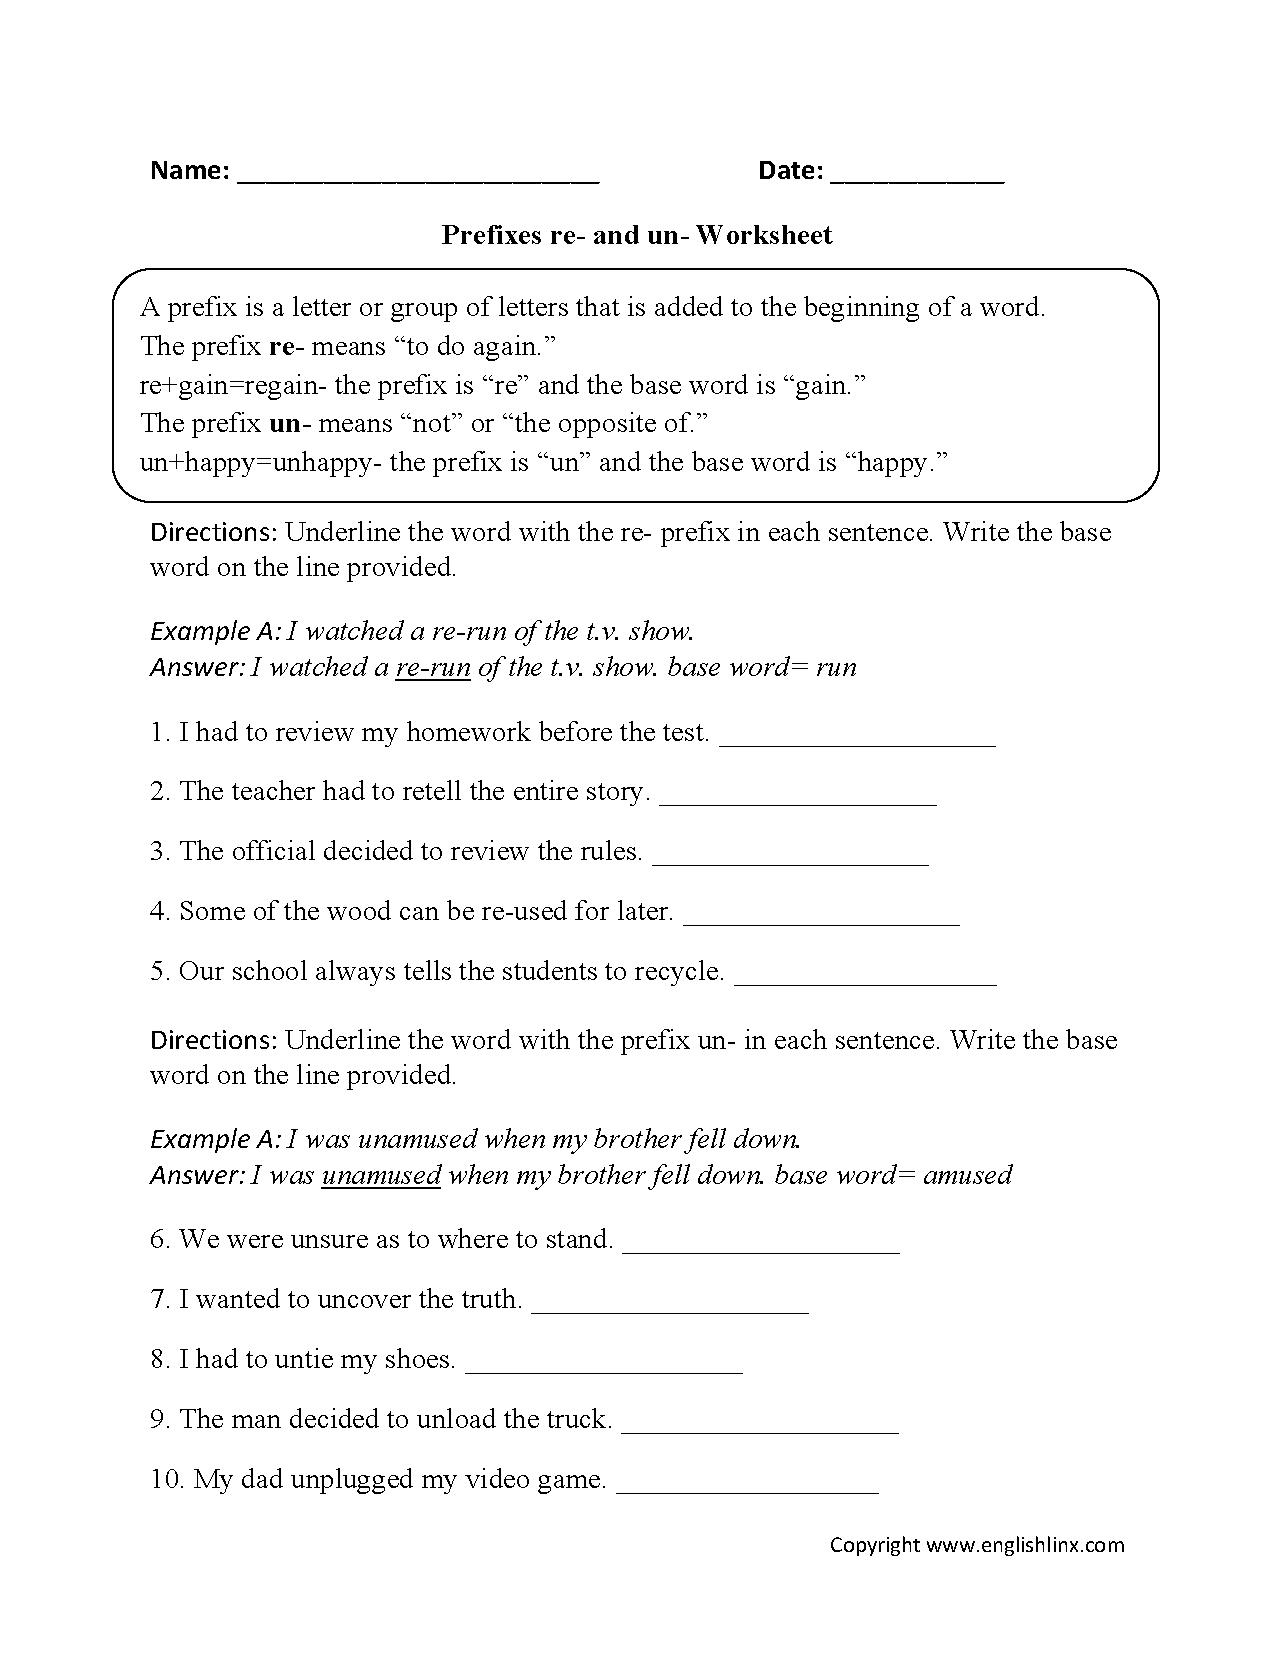 Un Words Worksheet : Prefixes re and un worksheets pinterest